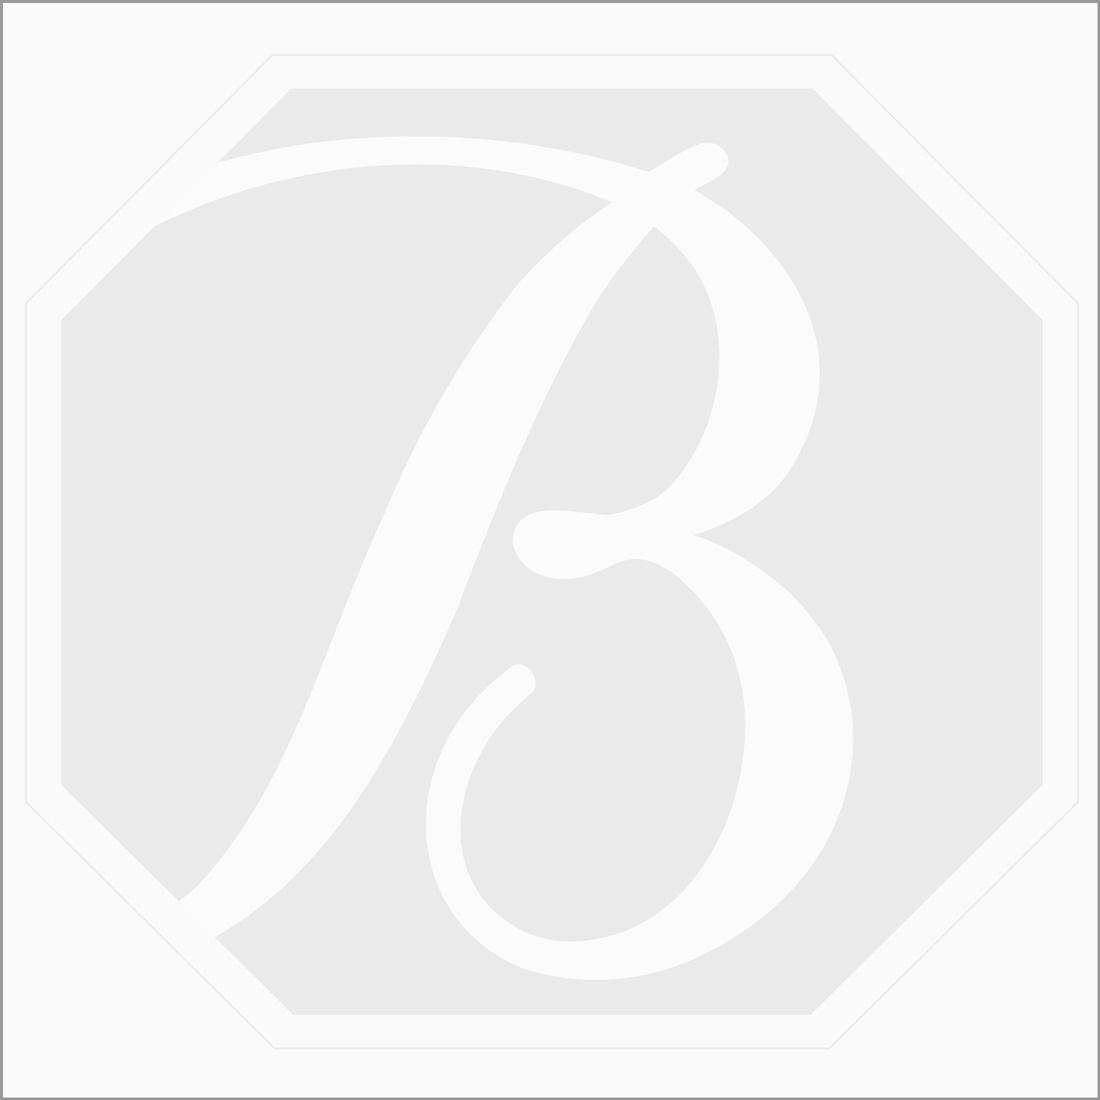 Multi-Tone Cubic Zirconia Pendant in 925 Sterling Silver